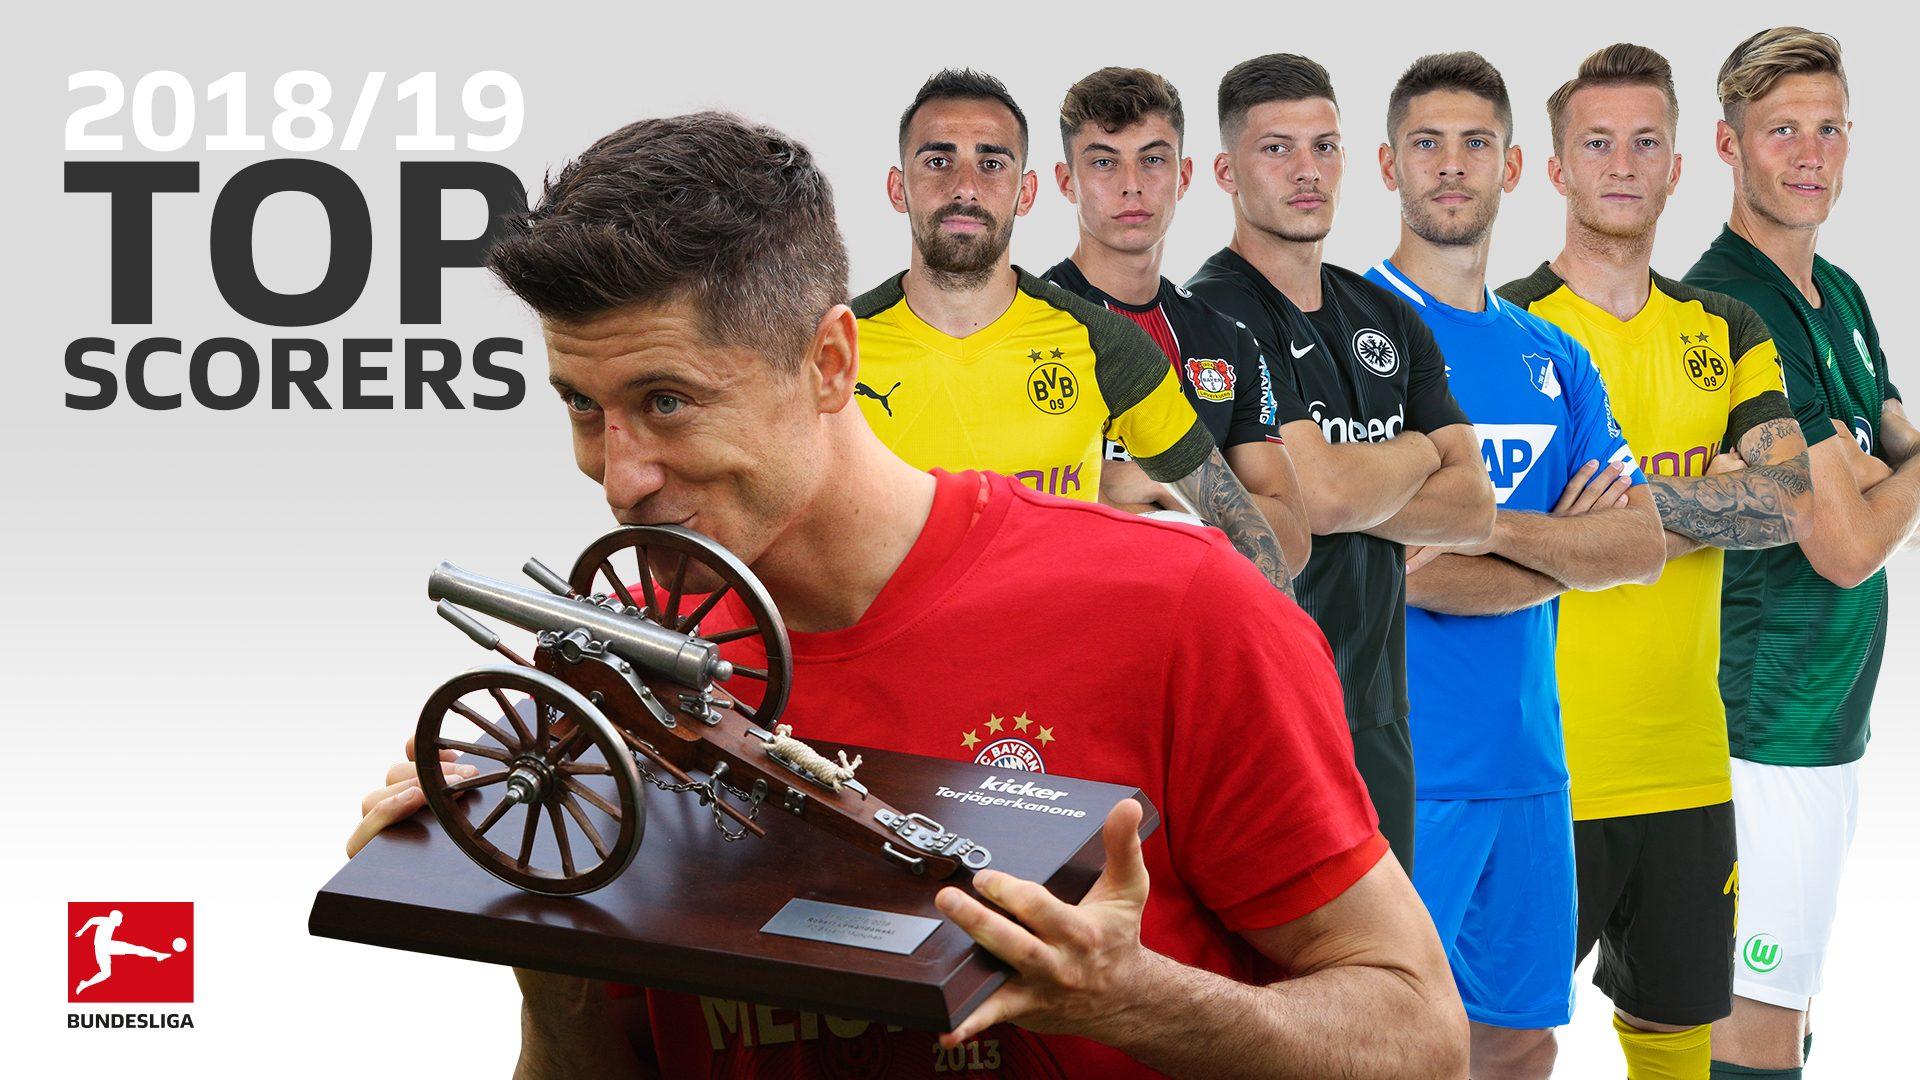 Bundesliga top scorer 2018/19: Who were the league's top marksmen?